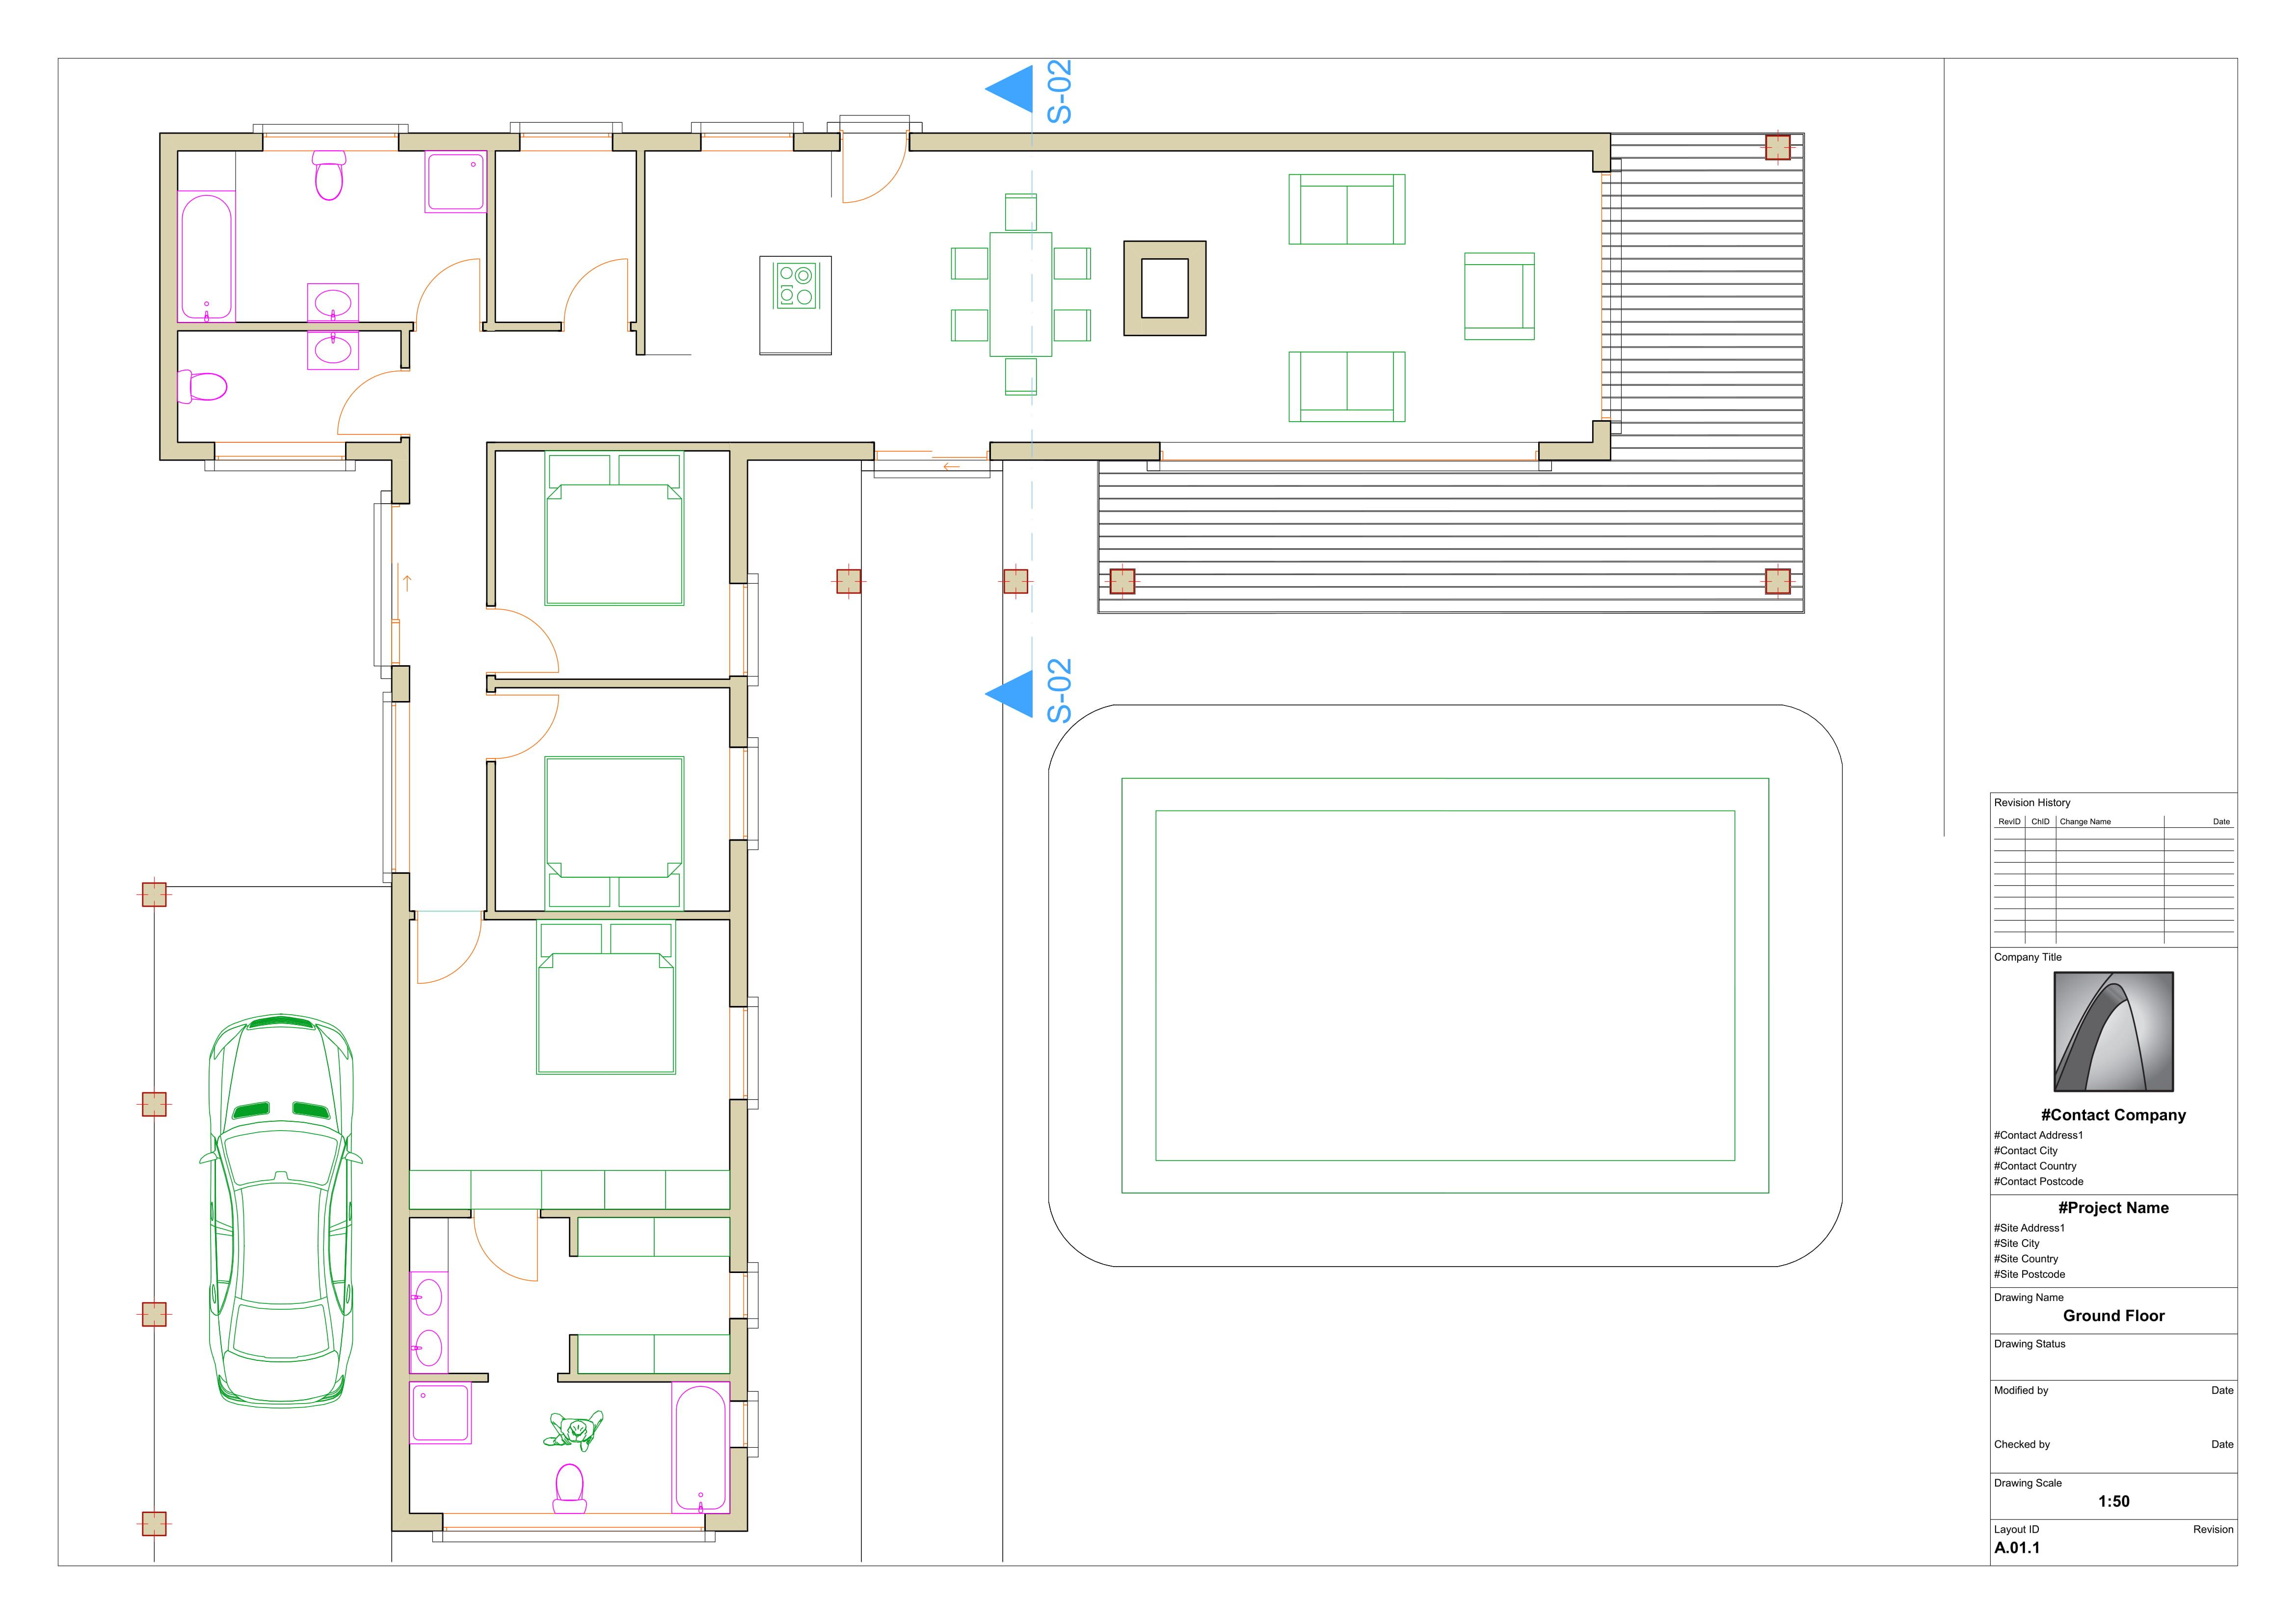 Modern Cape Dutch Style Imizekeliso Architecture Project Management